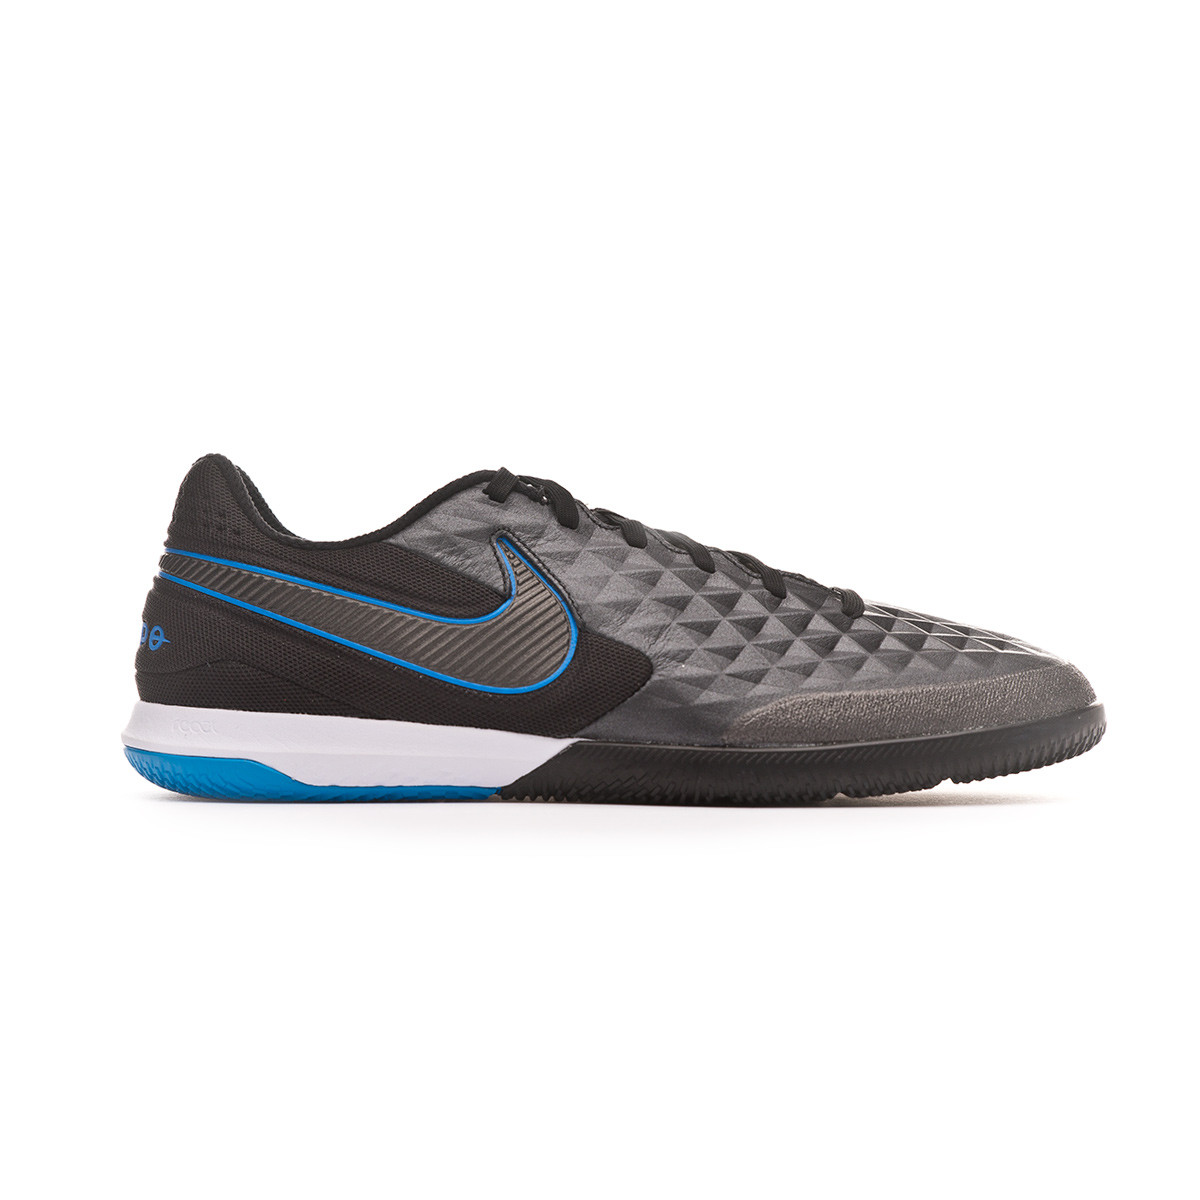 Sapatilha de Futsal Nike React Tiempo Legend VIII Pro IC